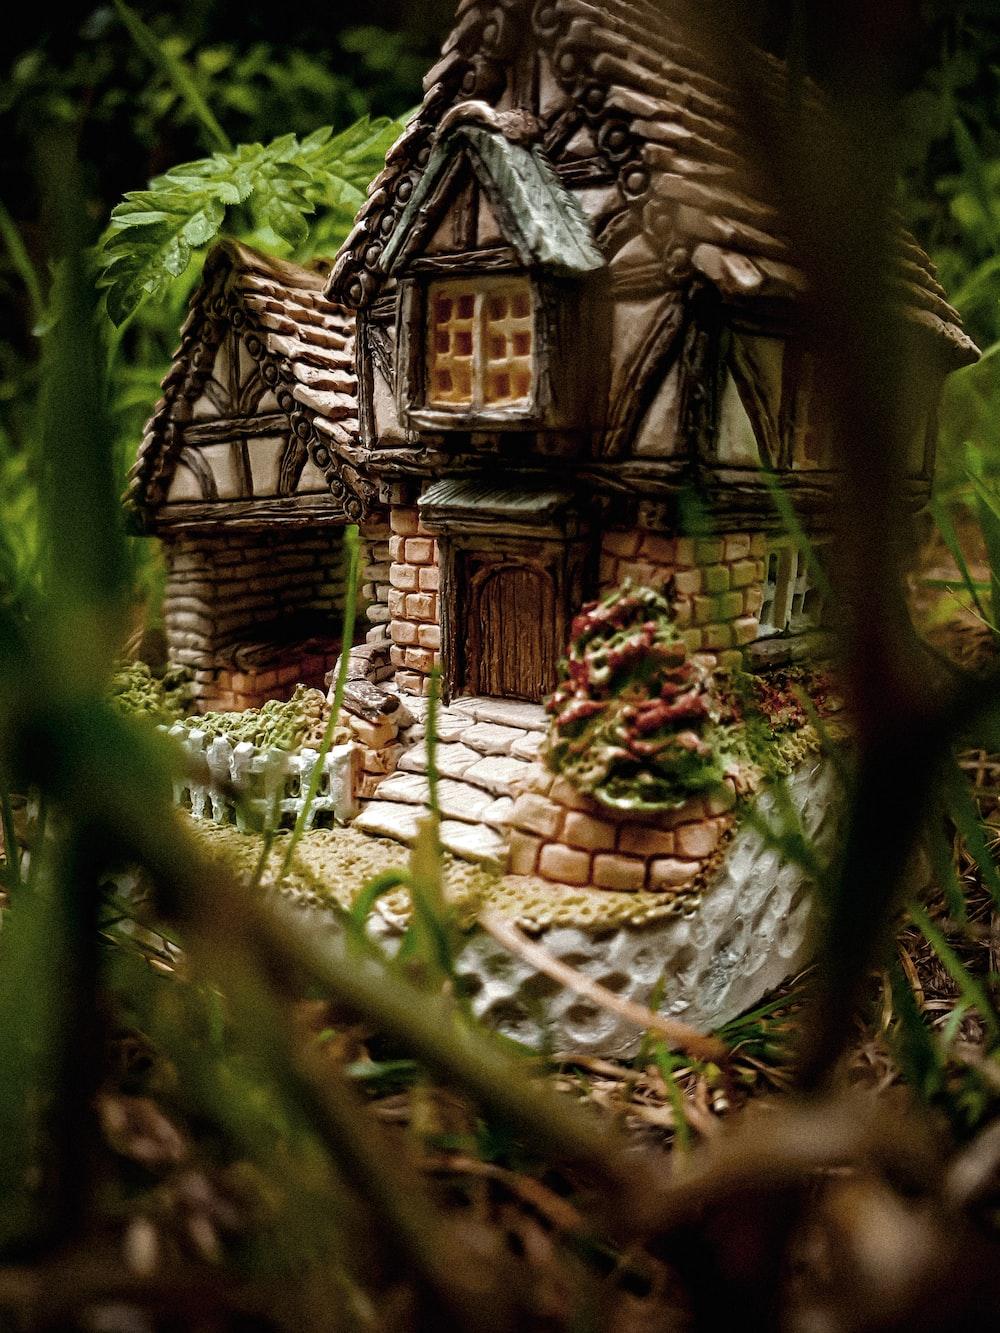 brown ceramic house ornament